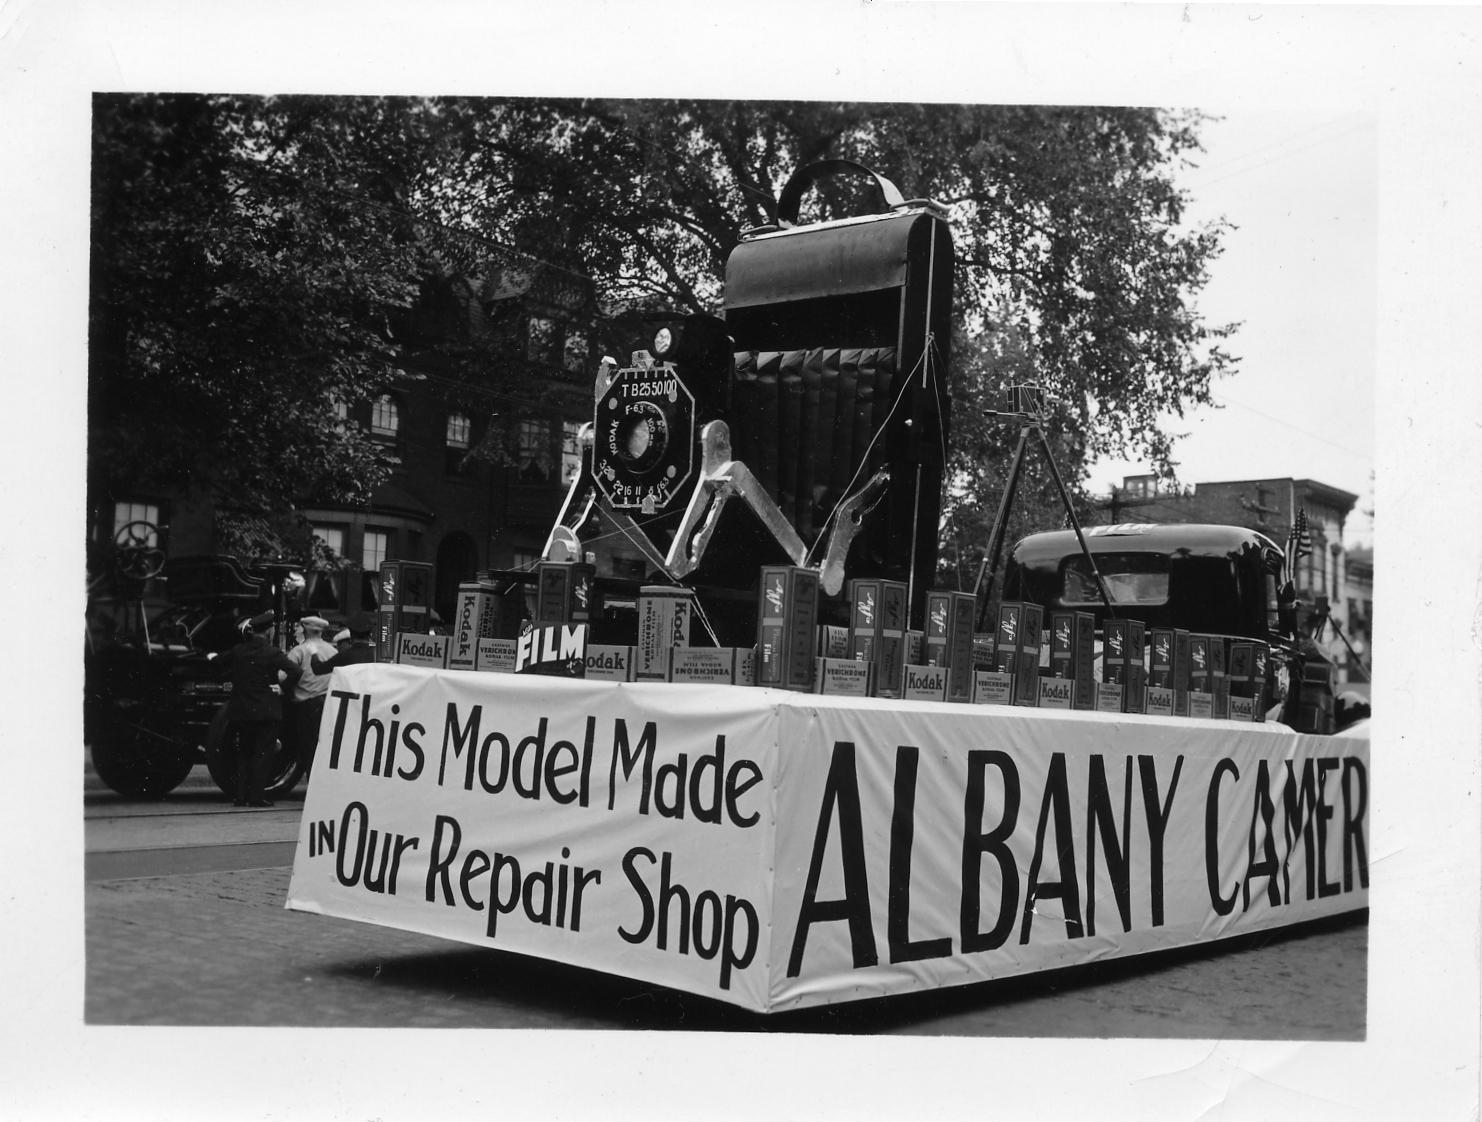 Albany Camera Shop Float